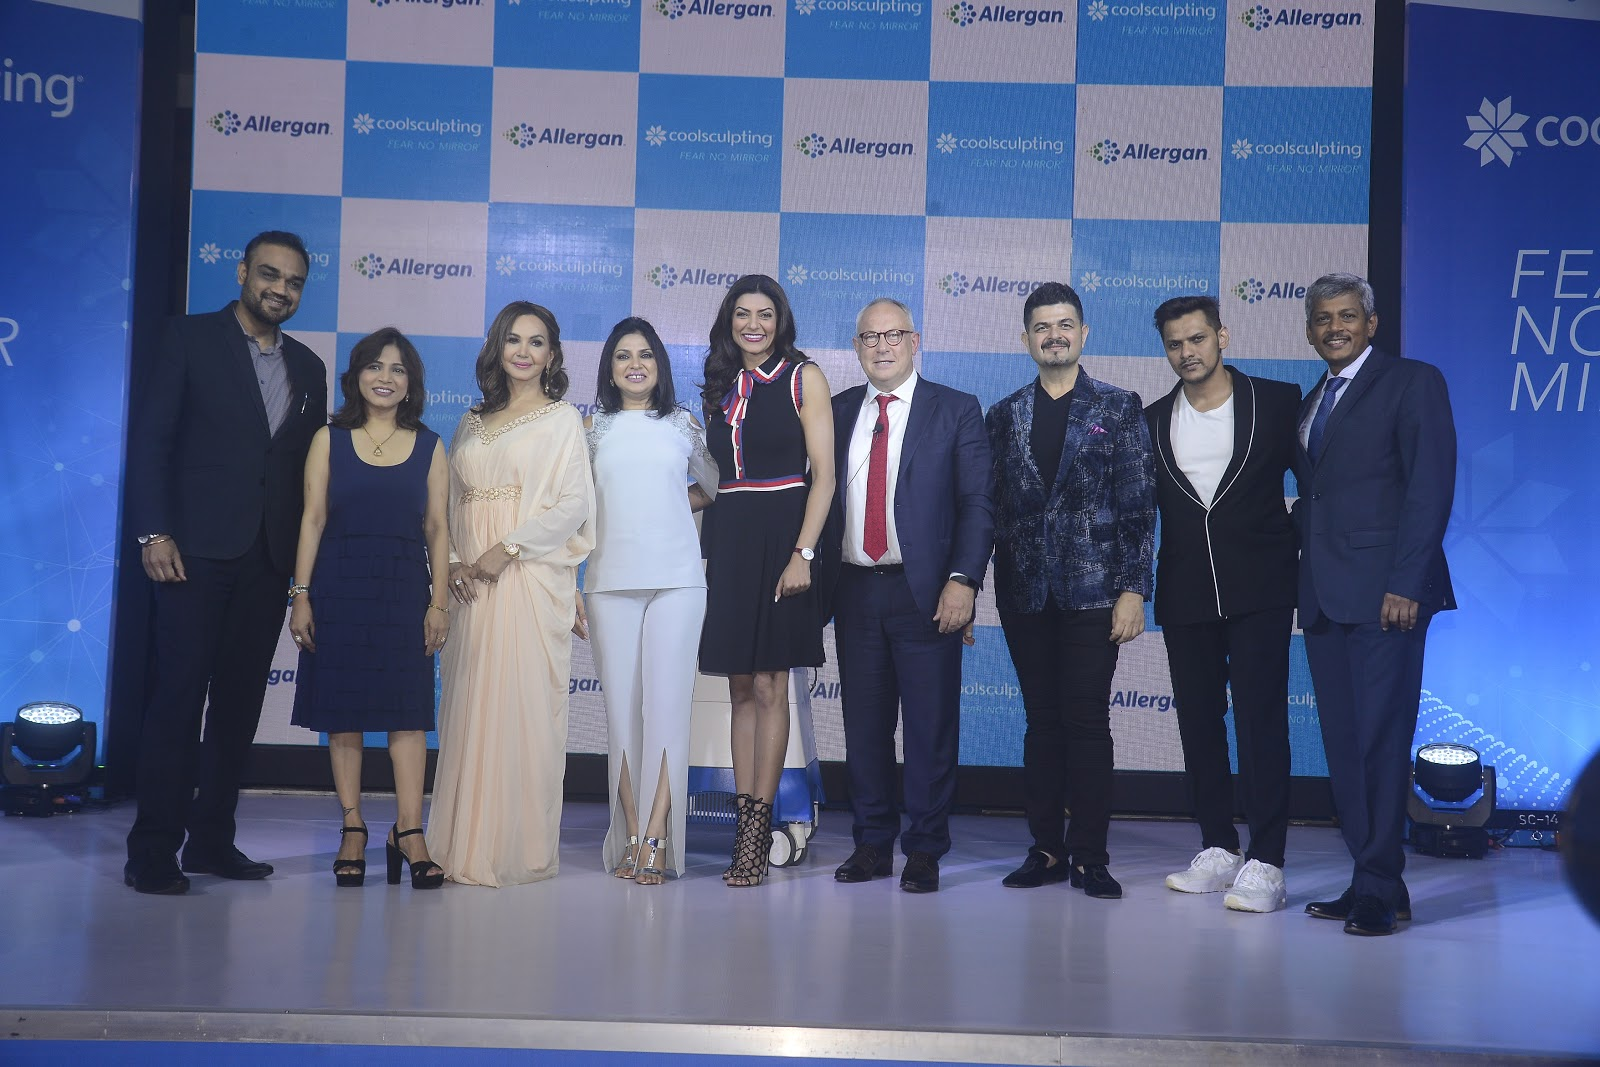 Allergan India Unveiling of CoolSculpting® in India